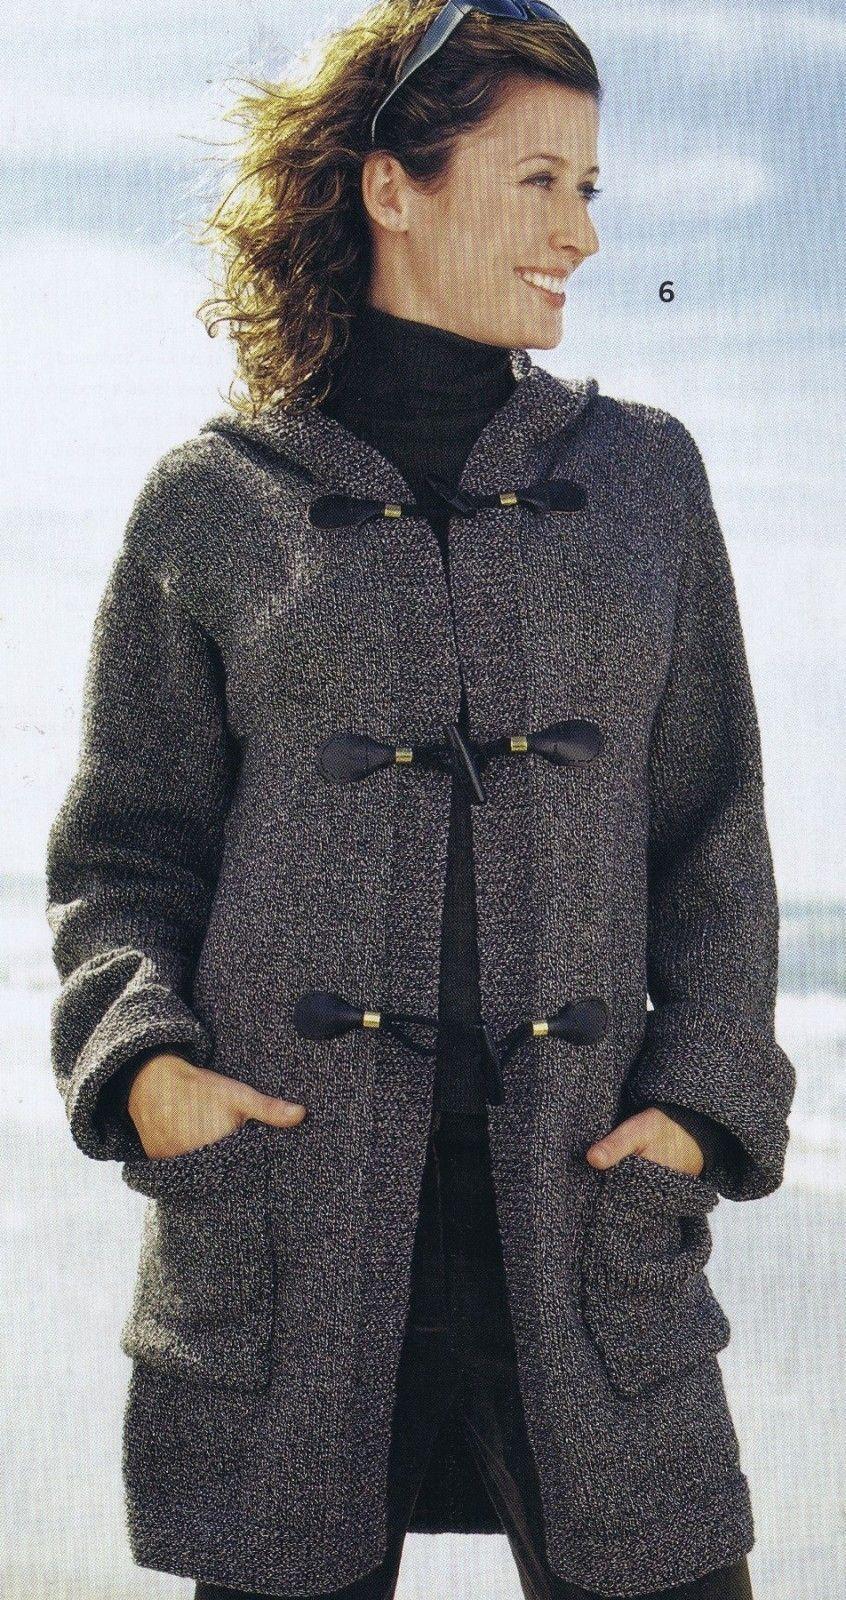 Vogue knitting patterns cardigan stole pullover coat jacket vest ...